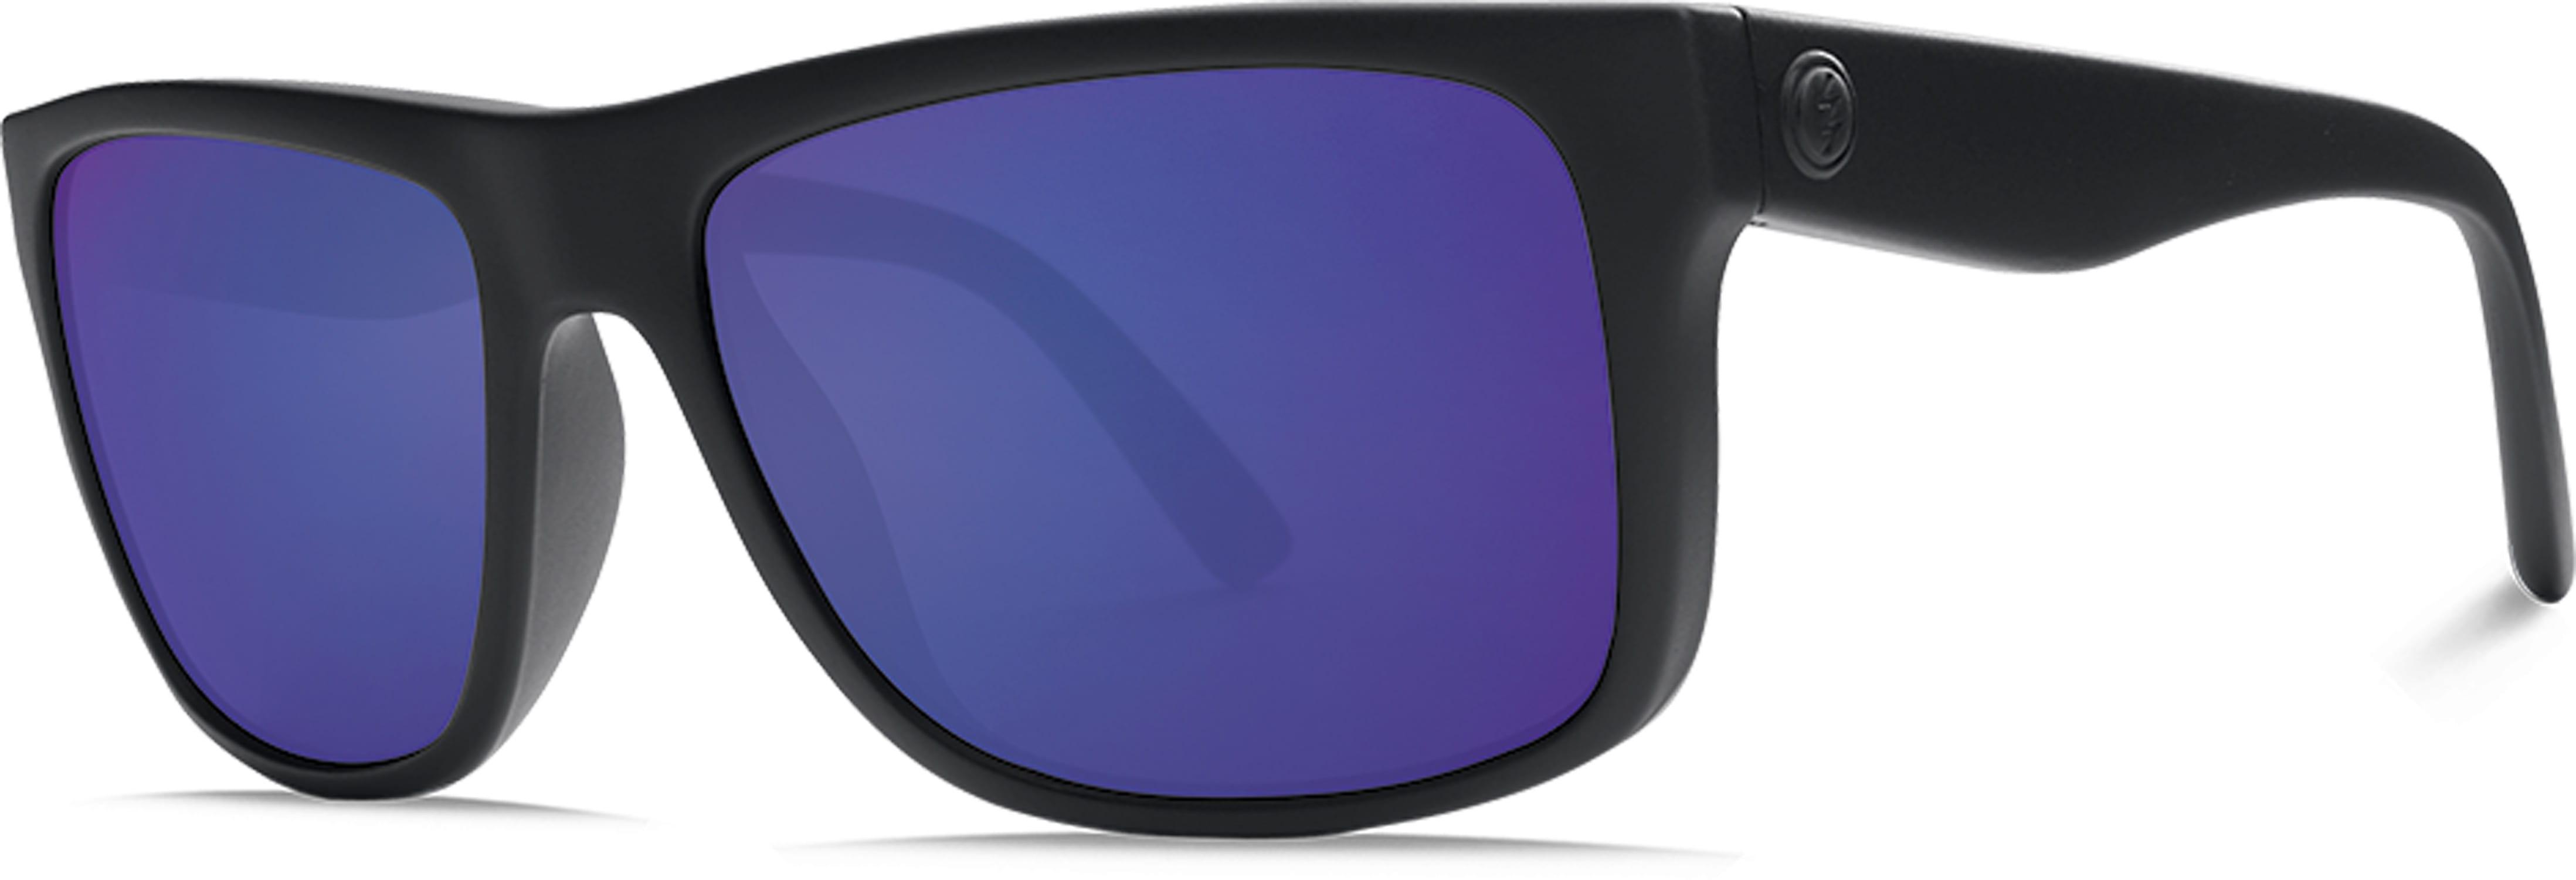 9b5f939d70 Electric Swingarm Sunglasses - thumbnail 1